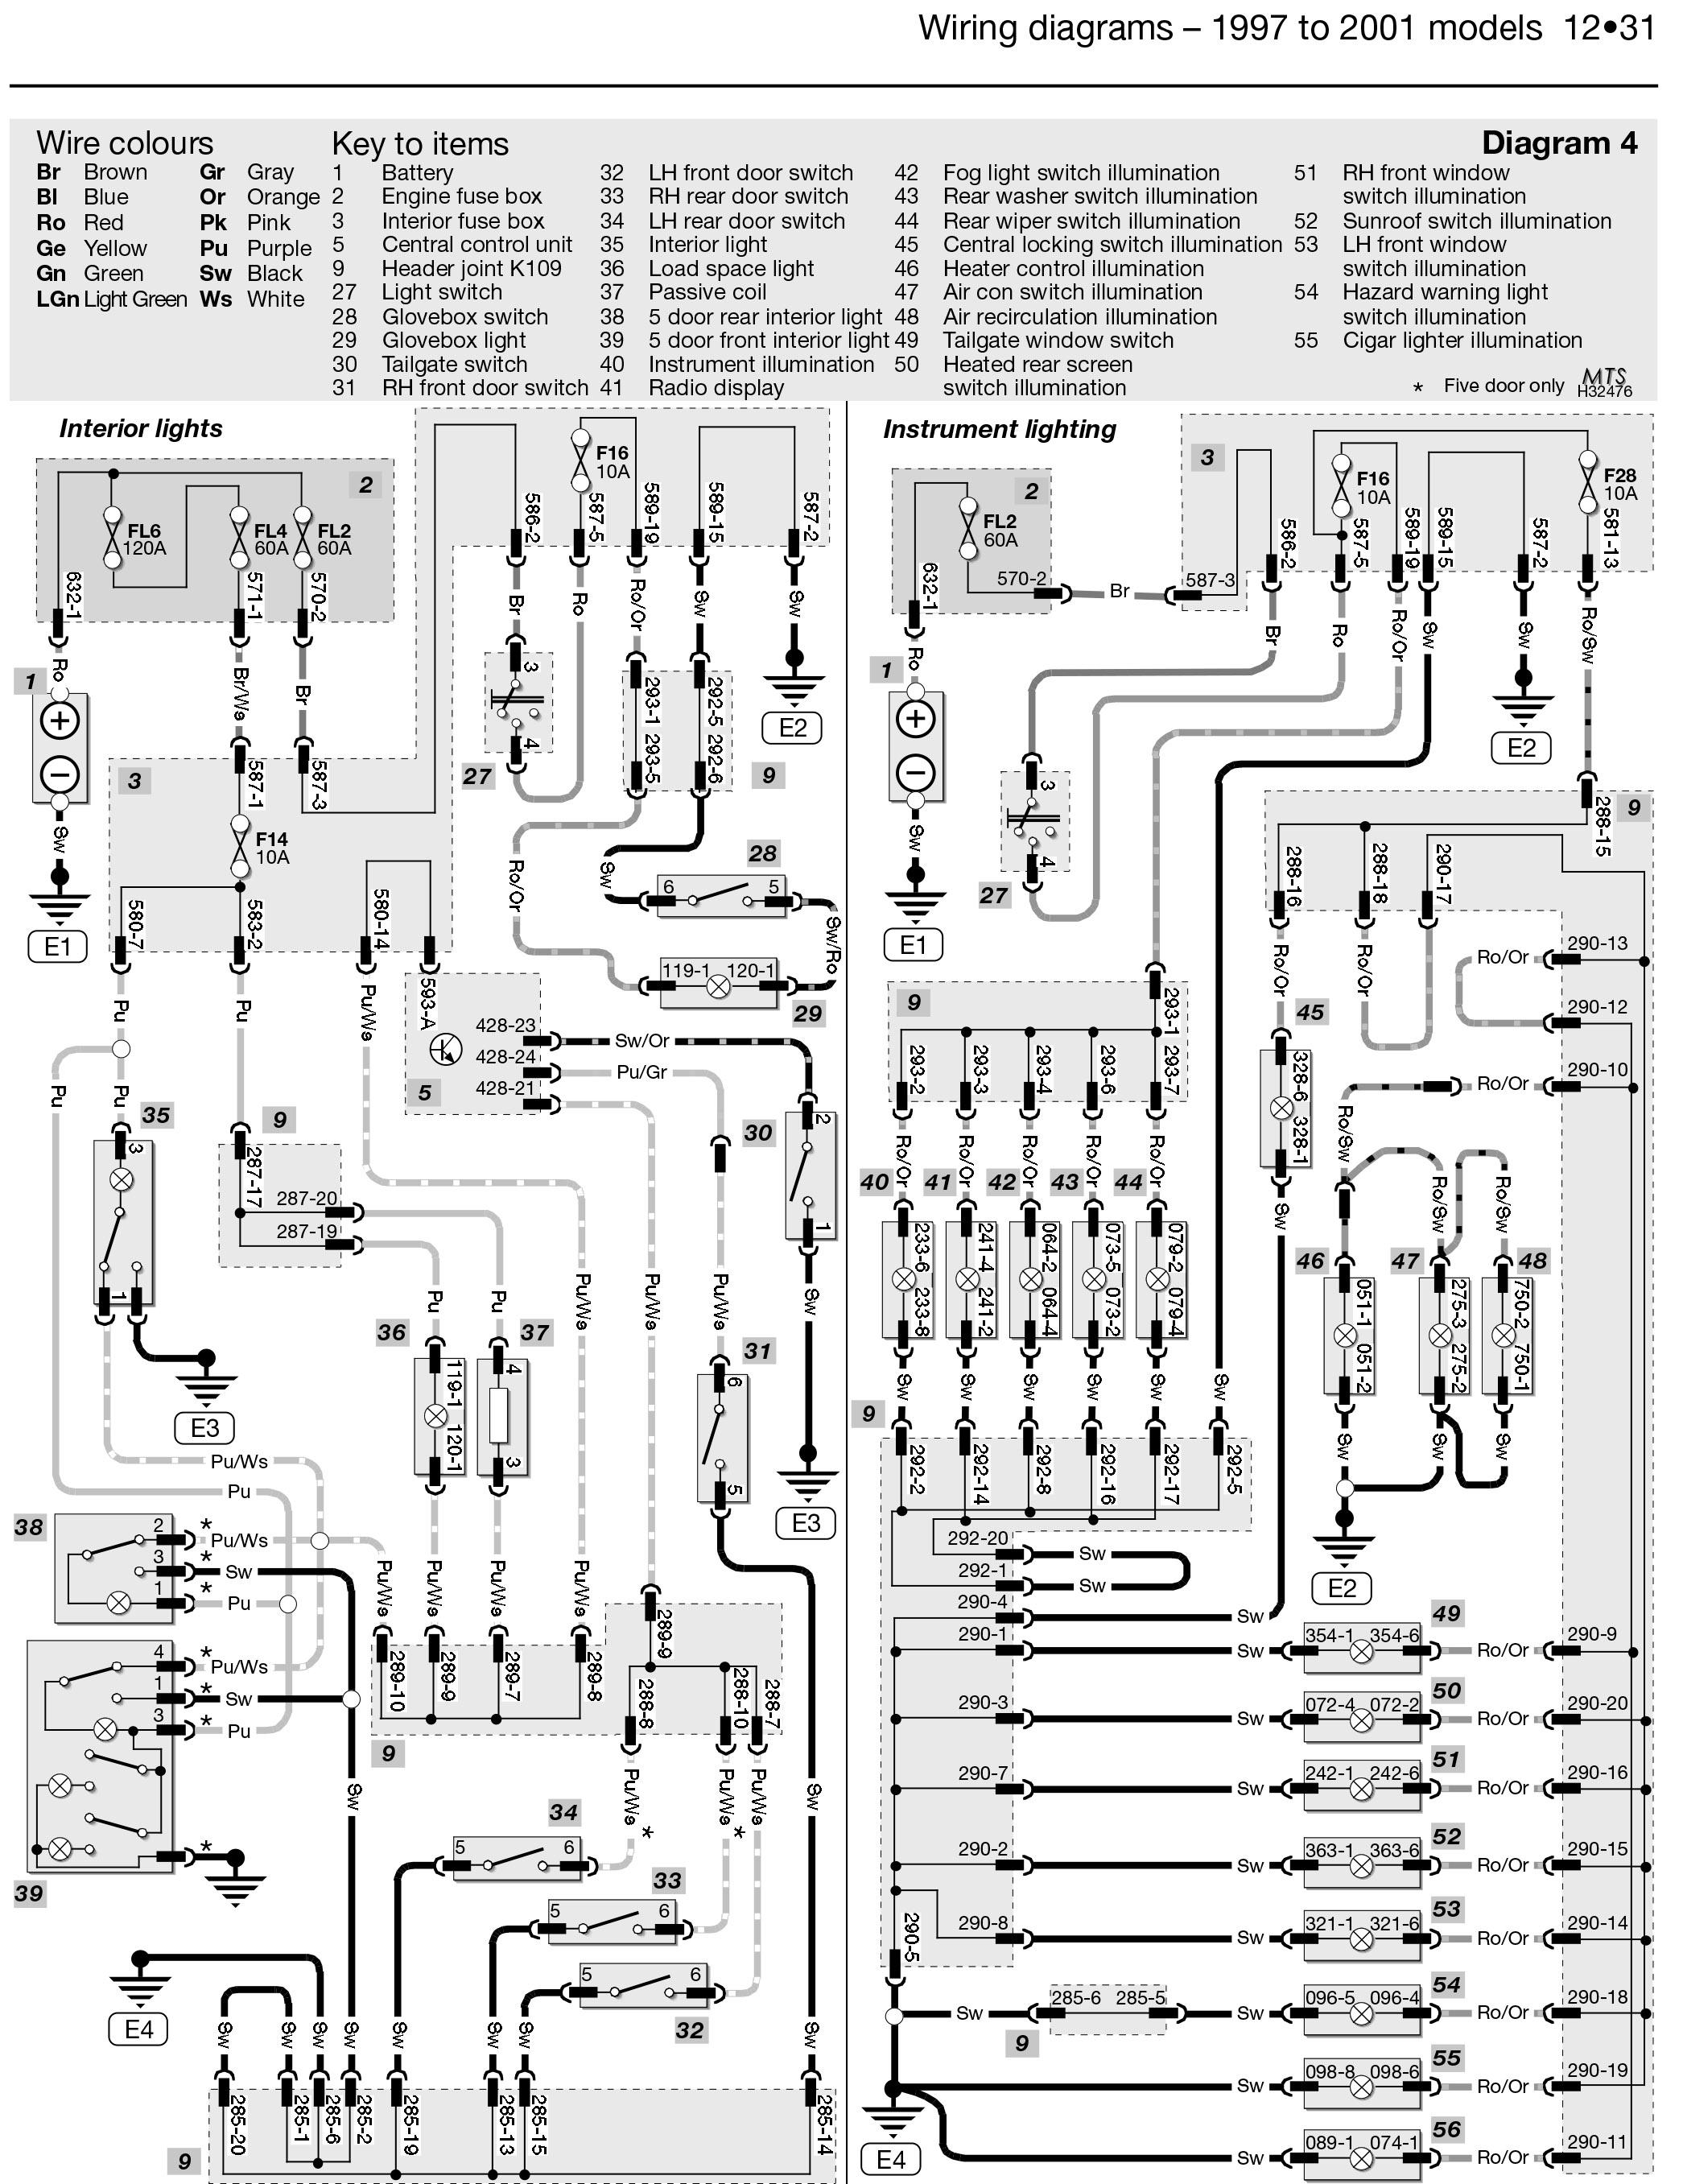 2002 Freelander Wiring Diagram